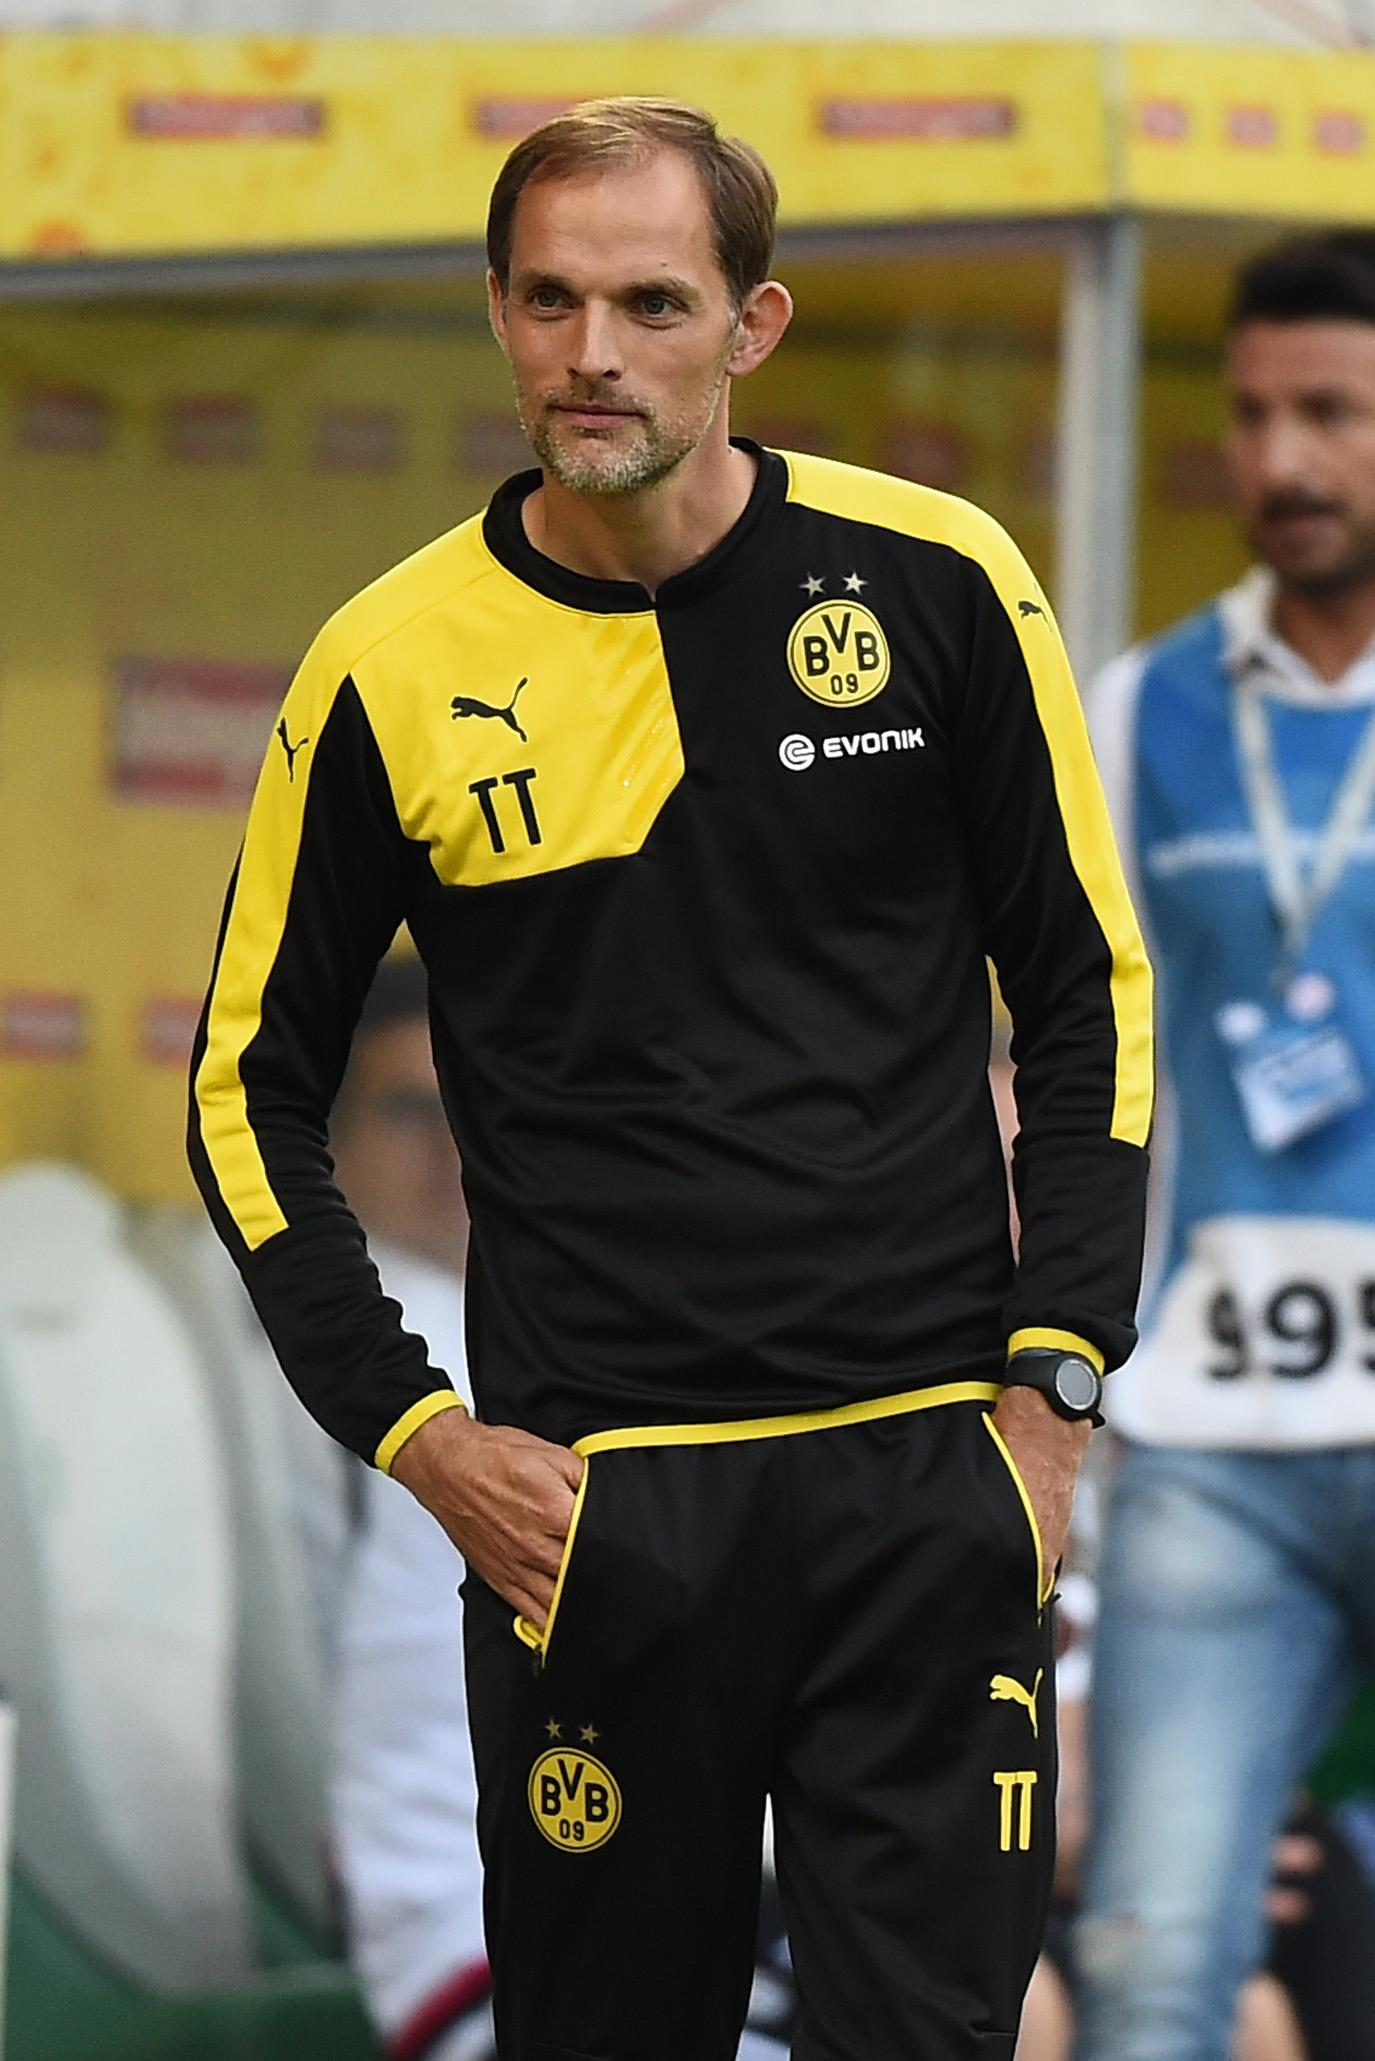 Borussia Dortmund: Liverpool sorpassato, in arrivo Guerreiro ...